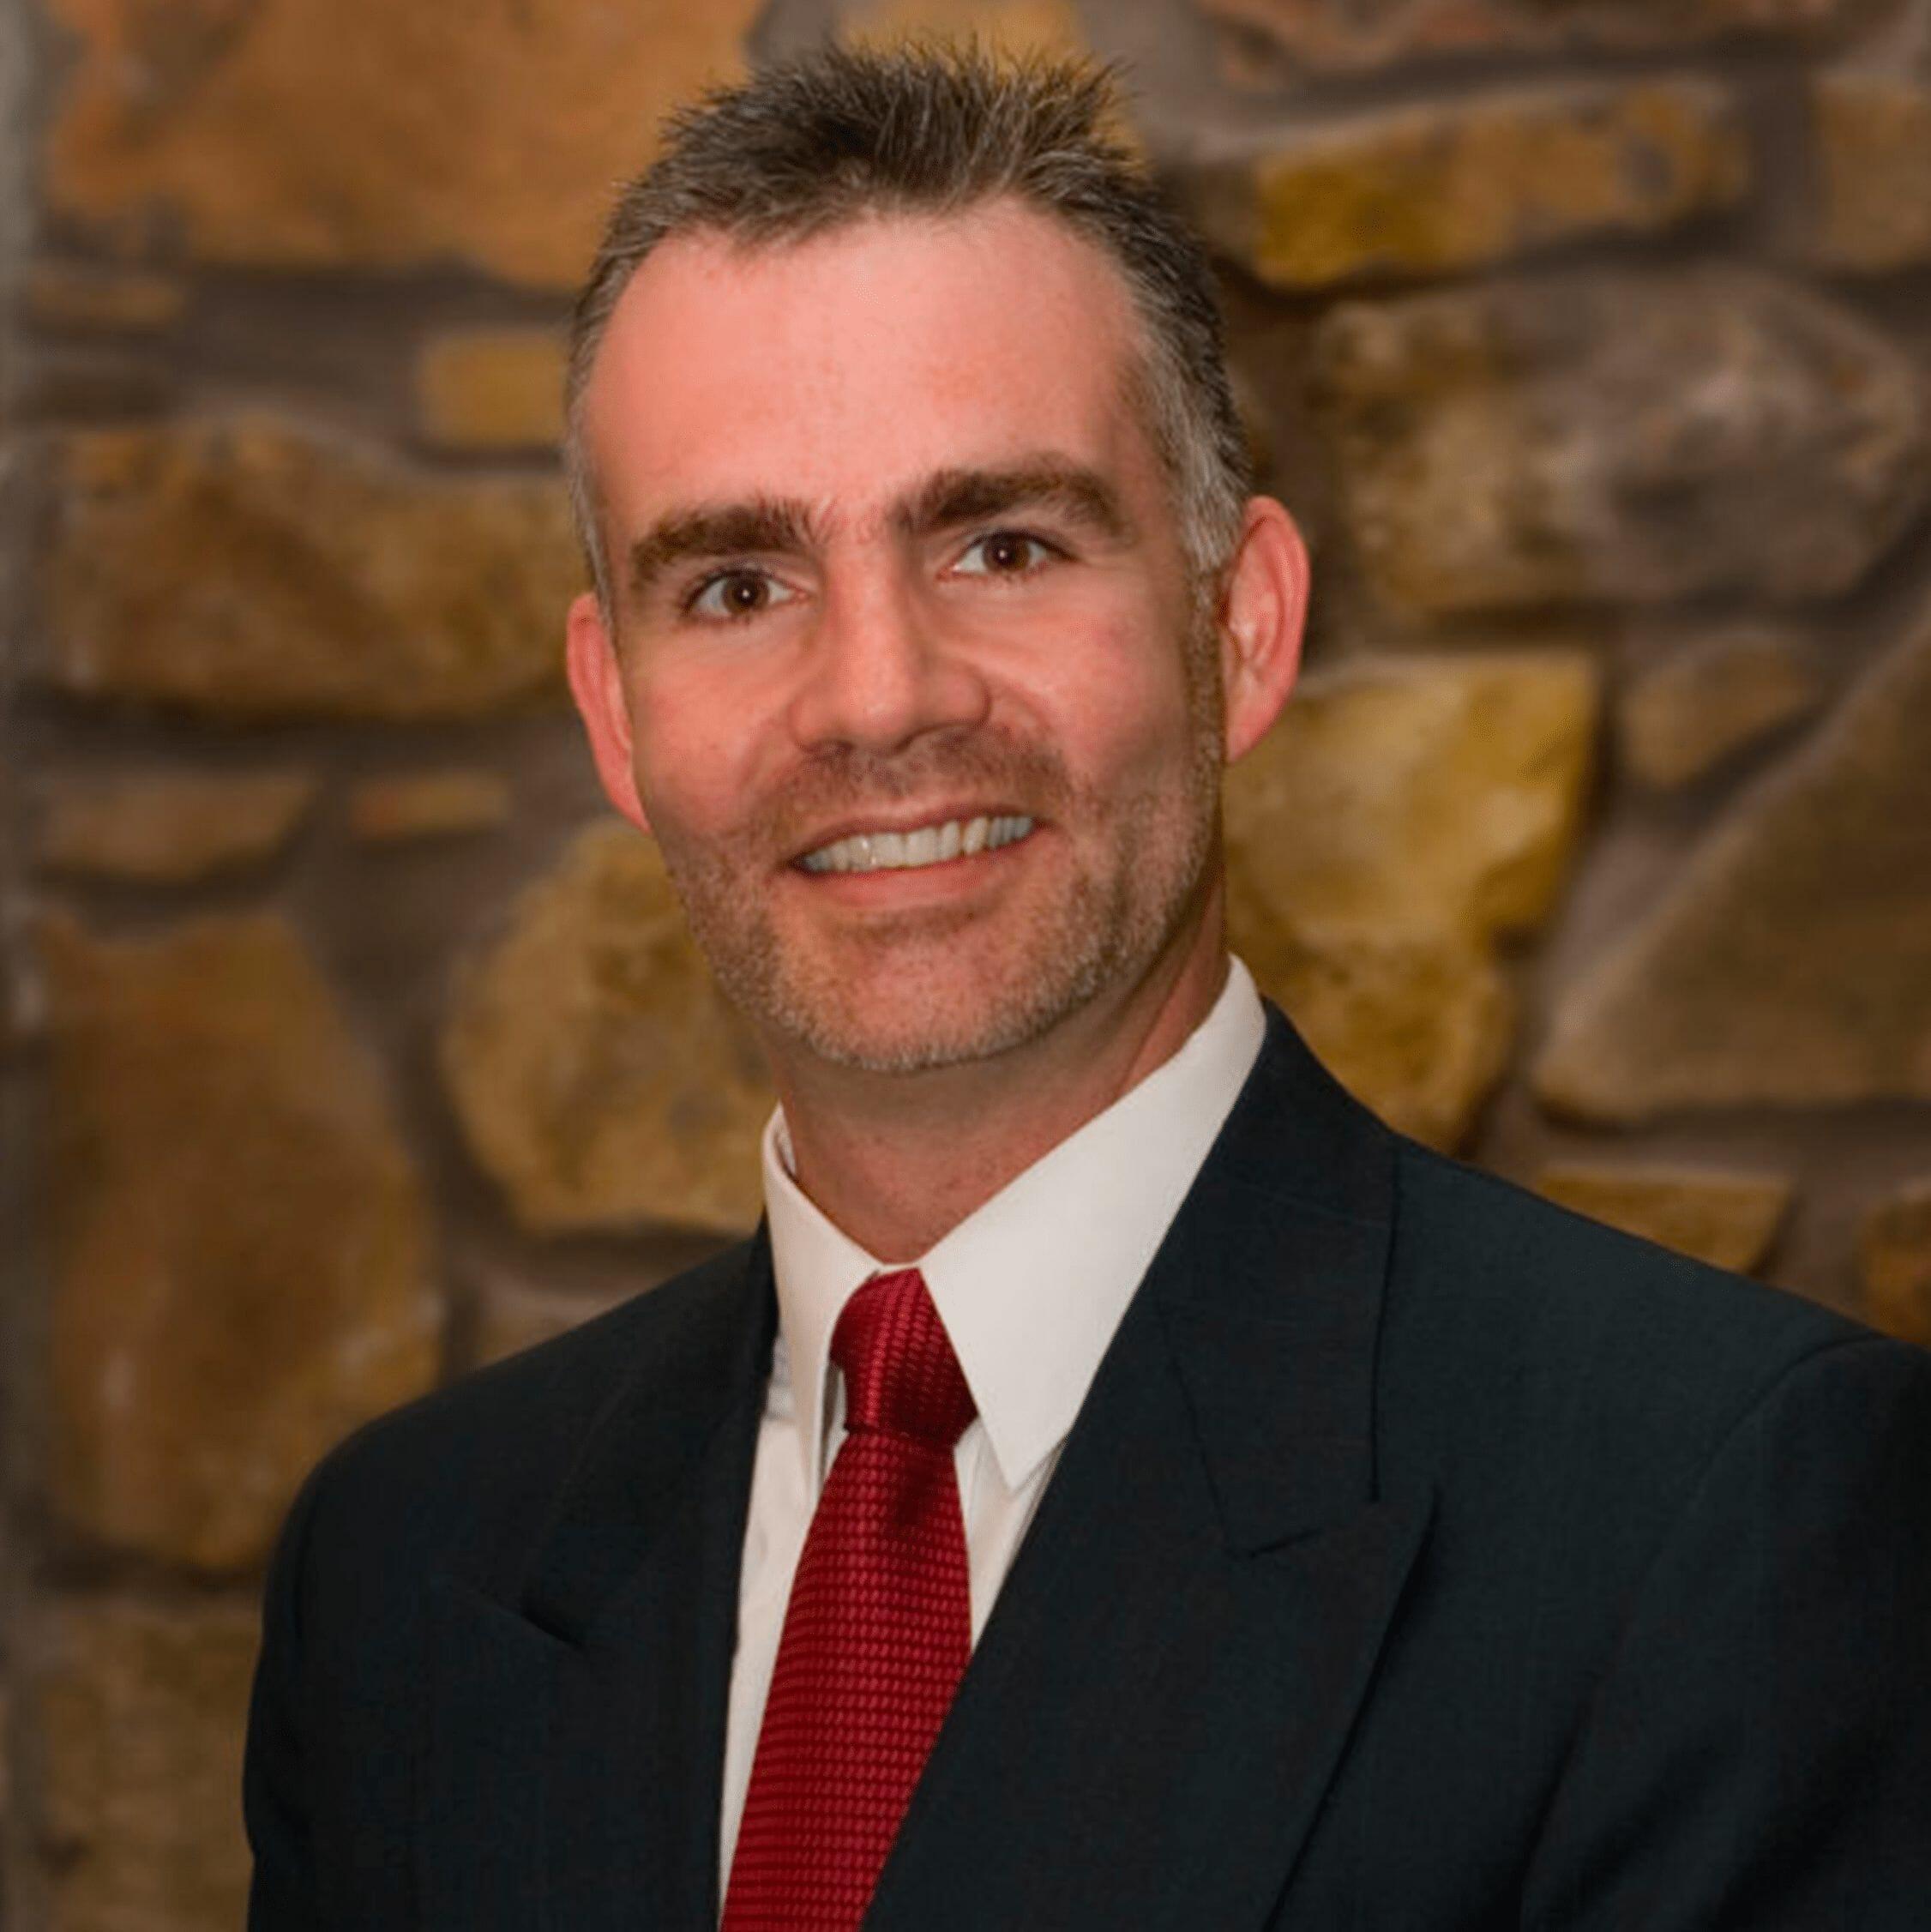 John Motazedi | CEO SNC Squared